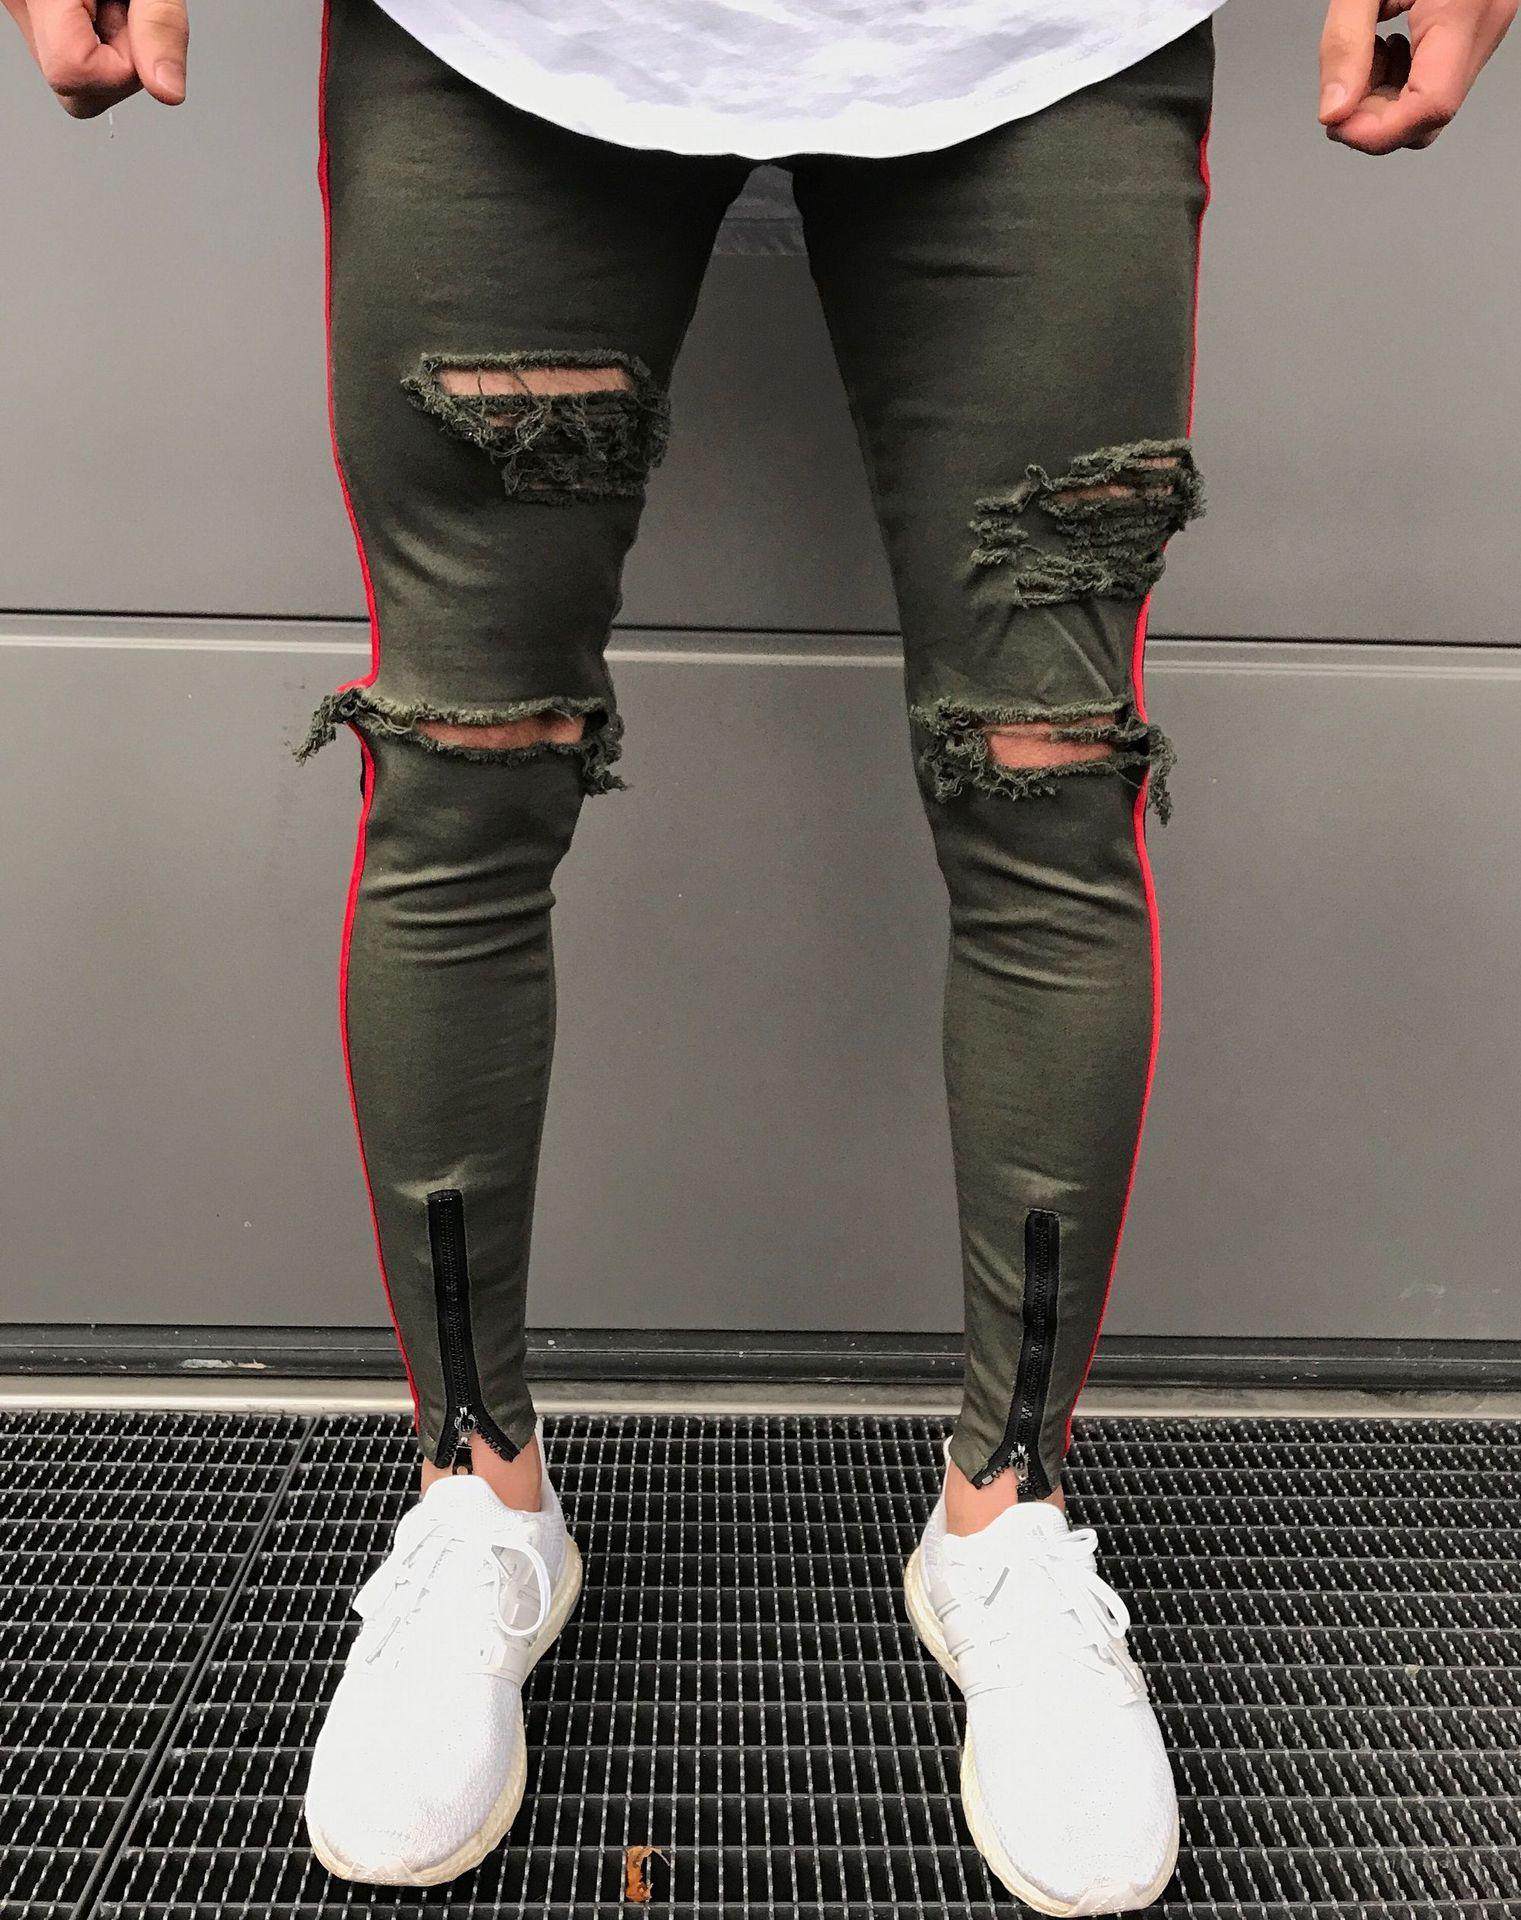 903fa8a8e7a New Mens Skinny Jeans Black Army Zipper Slim Biker Jeans Hip Hop Knee Hole  Ripped Denim High -Street Swag Plus Size Pants For Men Hole Biker Jeans Hip  Hop ...